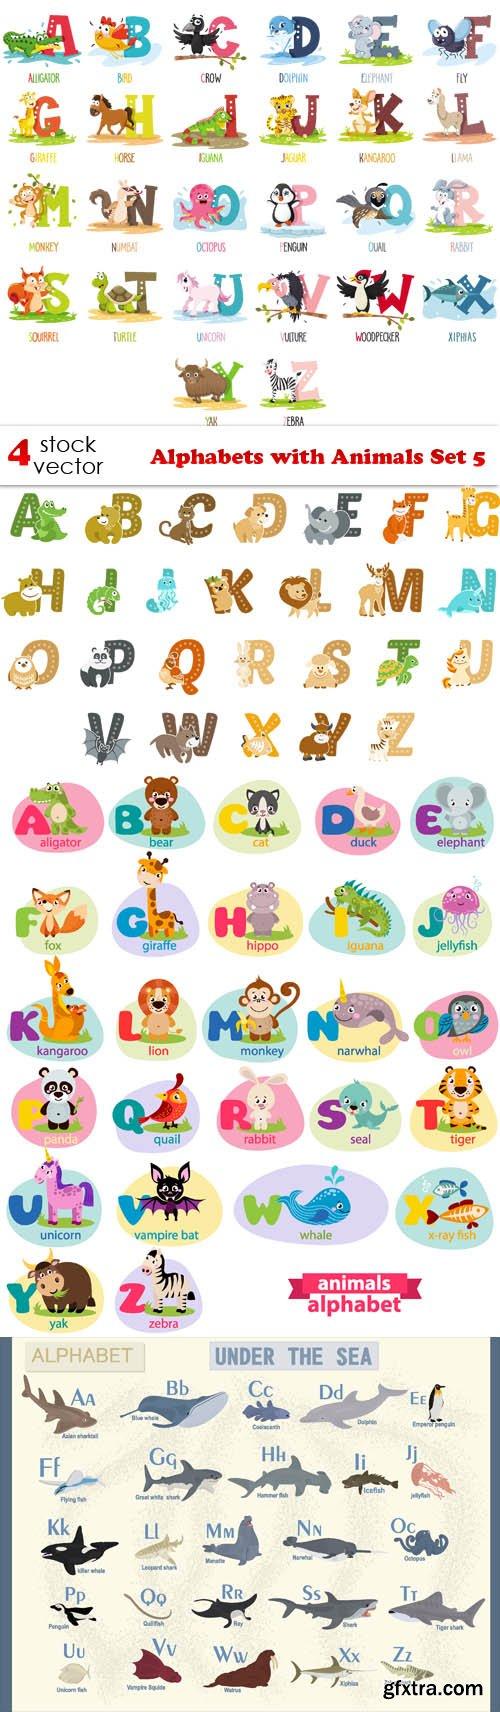 Vectors - Alphabets with Animals Set 5